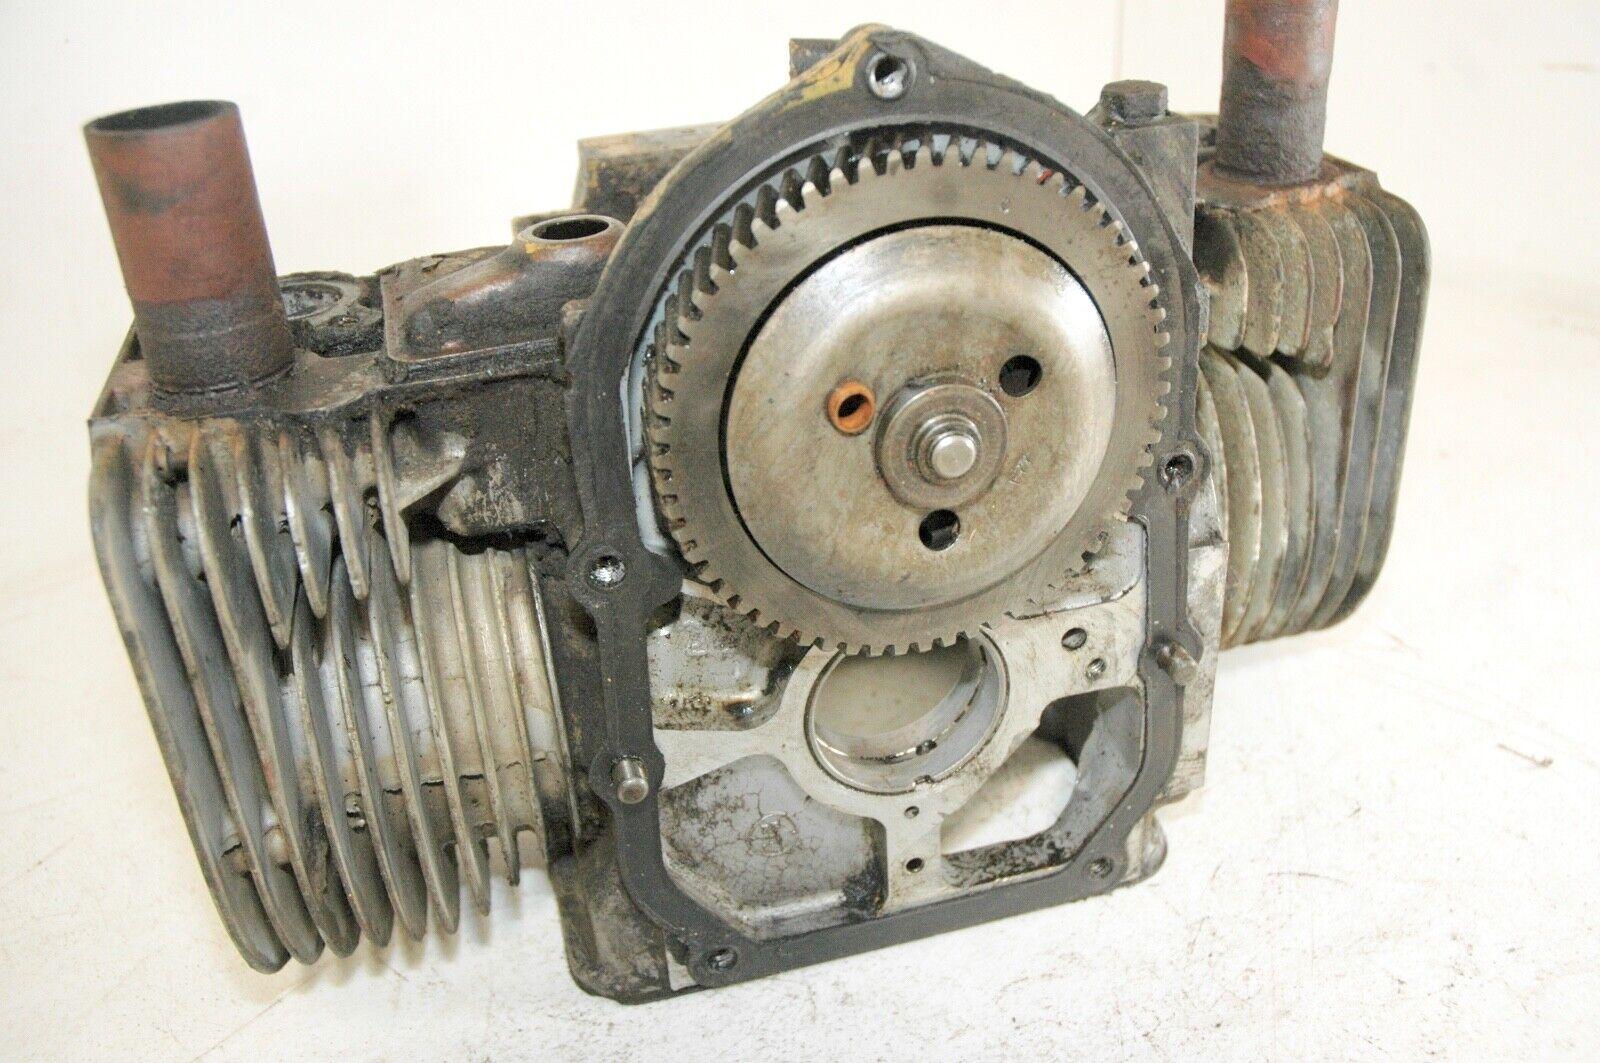 CASE 446 GARDEN TRACTOR ONAN B43M 16HP GAS ENGINE SERVICE MANUAL PARTS CATALOG